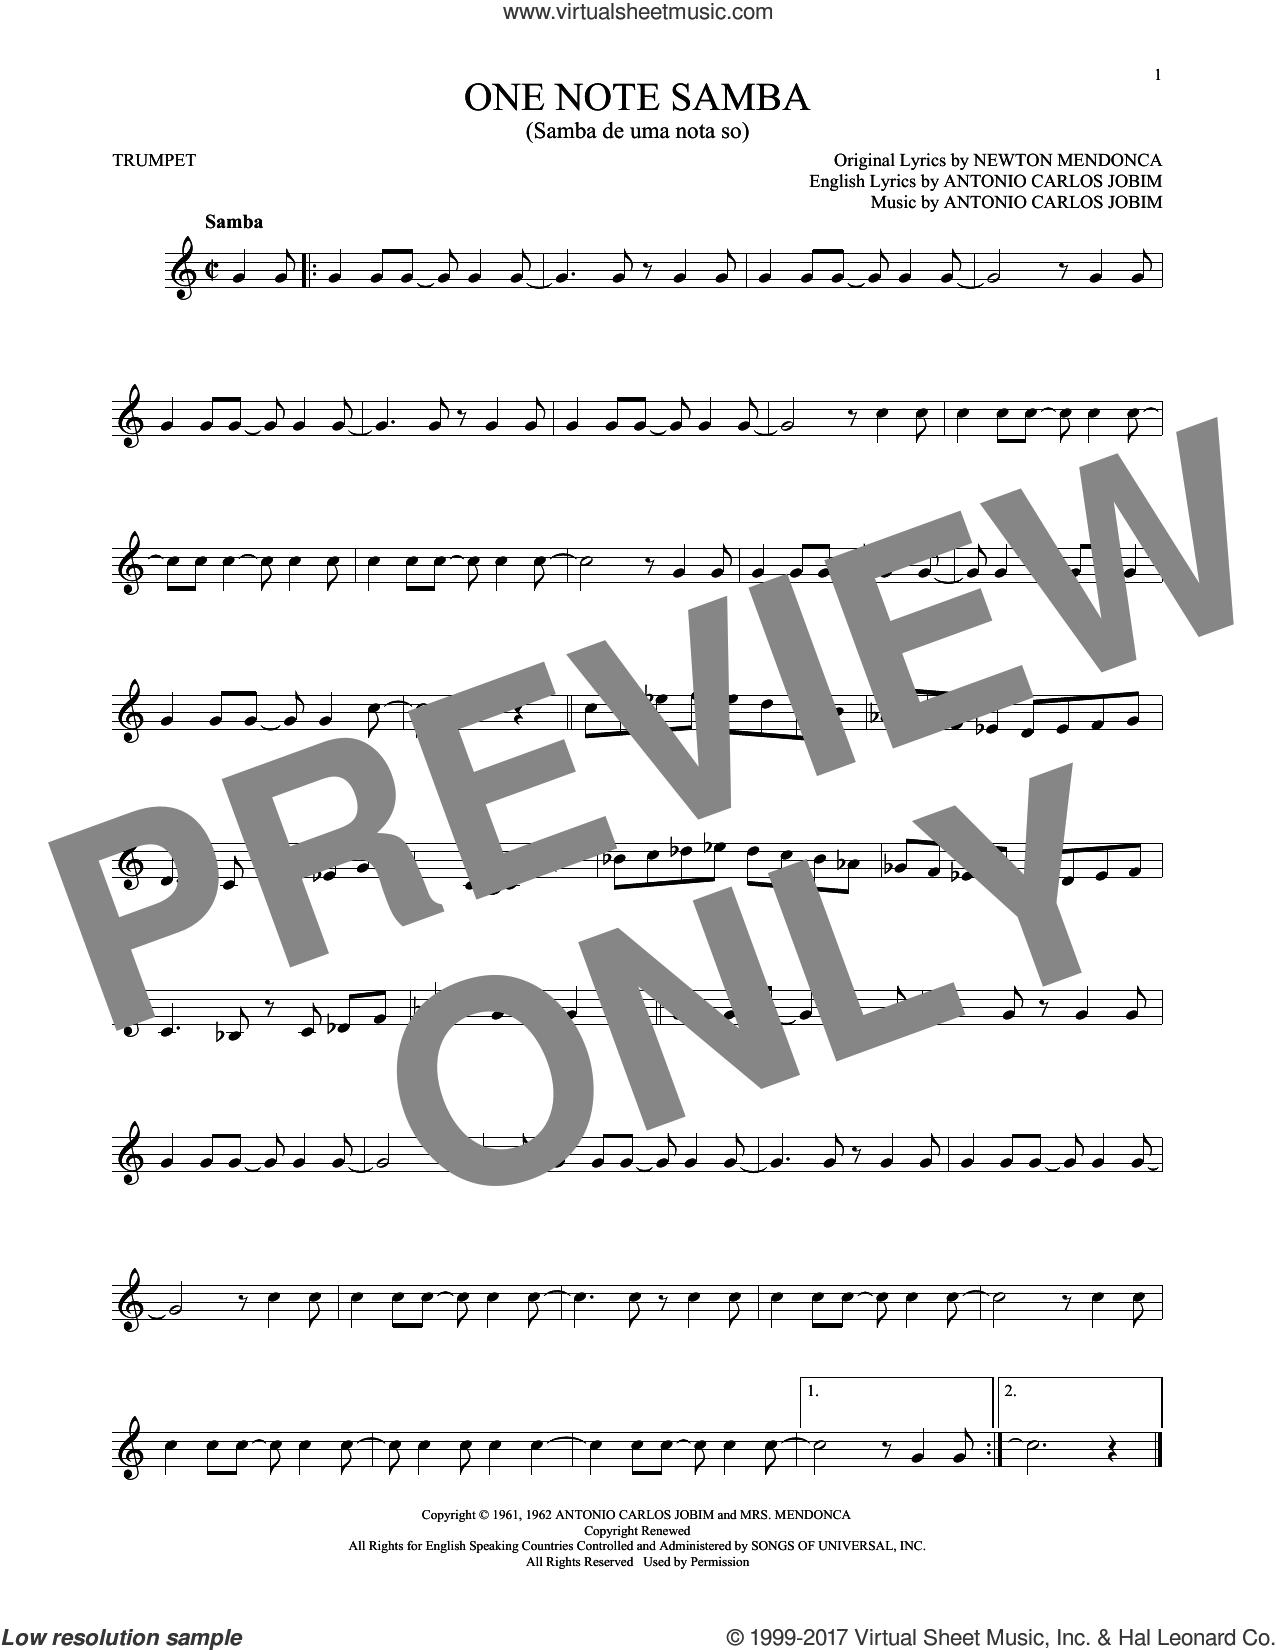 One Note Samba (Samba De Uma Nota So) sheet music for trumpet solo by Antonio Carlos Jobim, Pat Thomas and Newton Mendonca, intermediate skill level